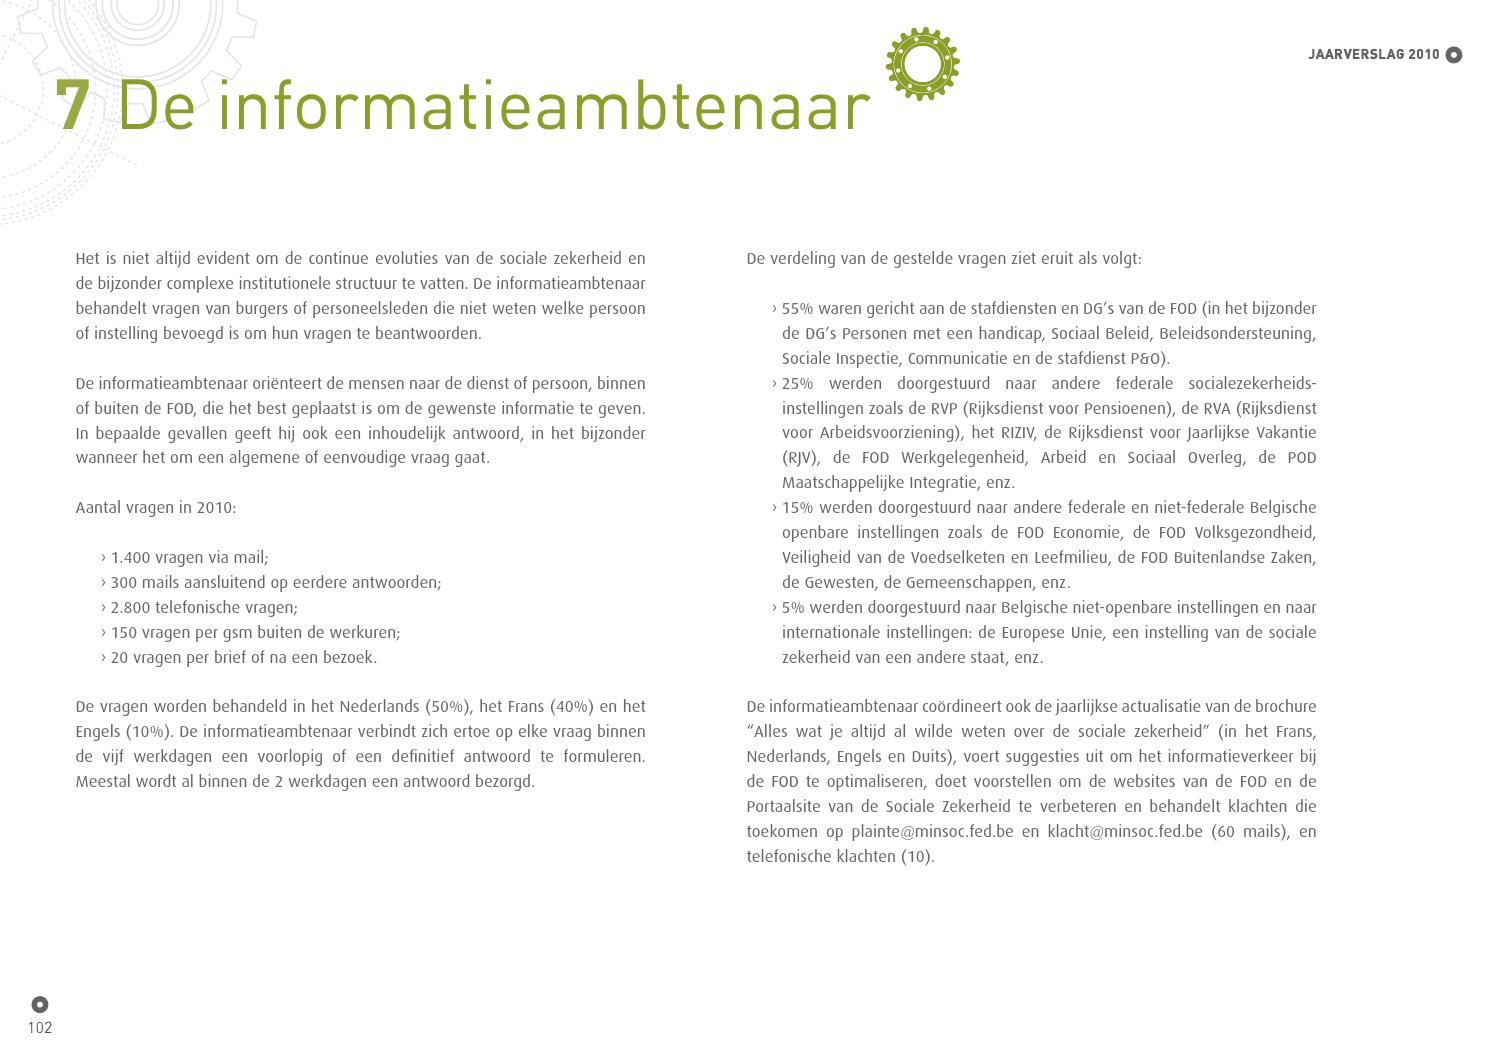 Jaarverslag Fod Sociale Zekerheid 2010 In Touch With Our